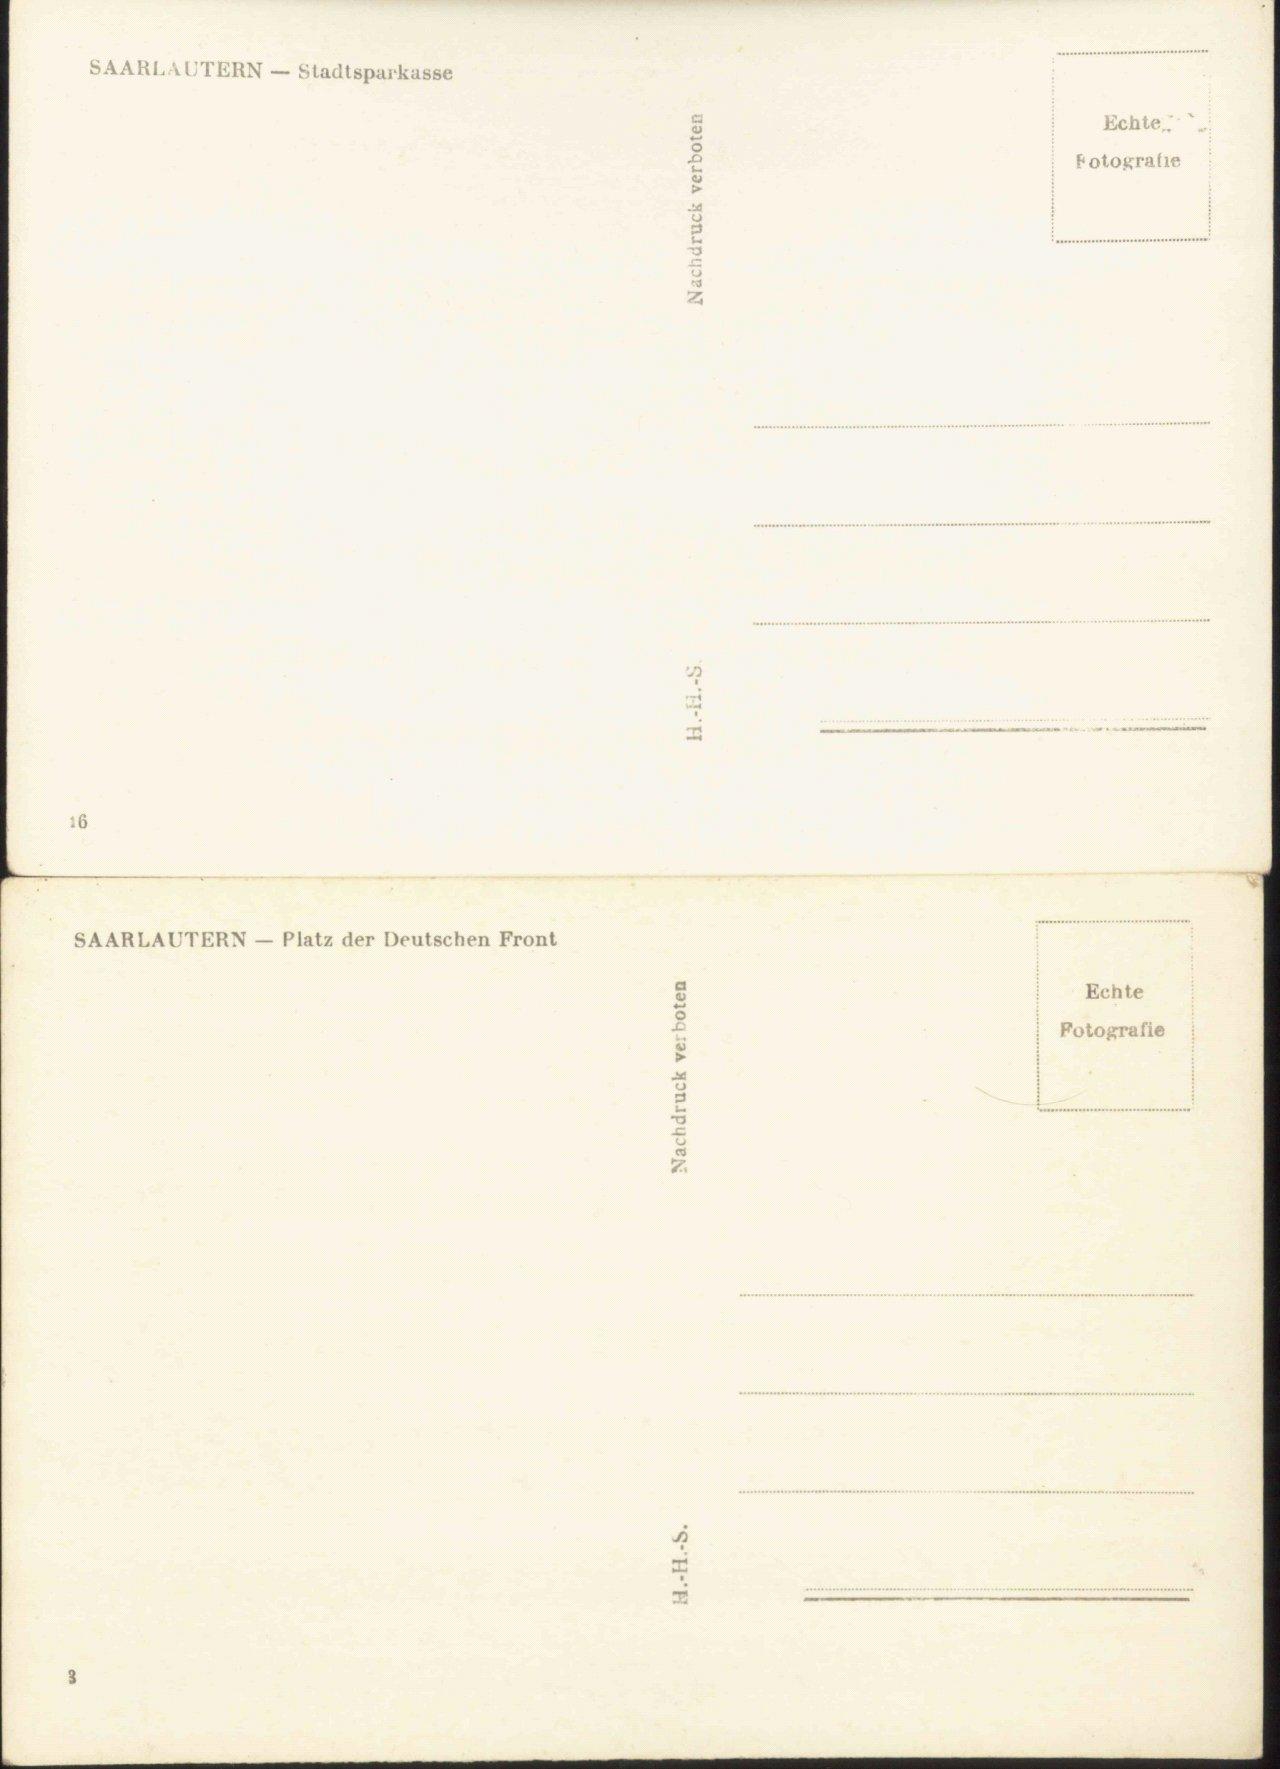 SAARLAUTERN Ansichtskarten, STRASSENBAHN!, OLDTIMER!-1